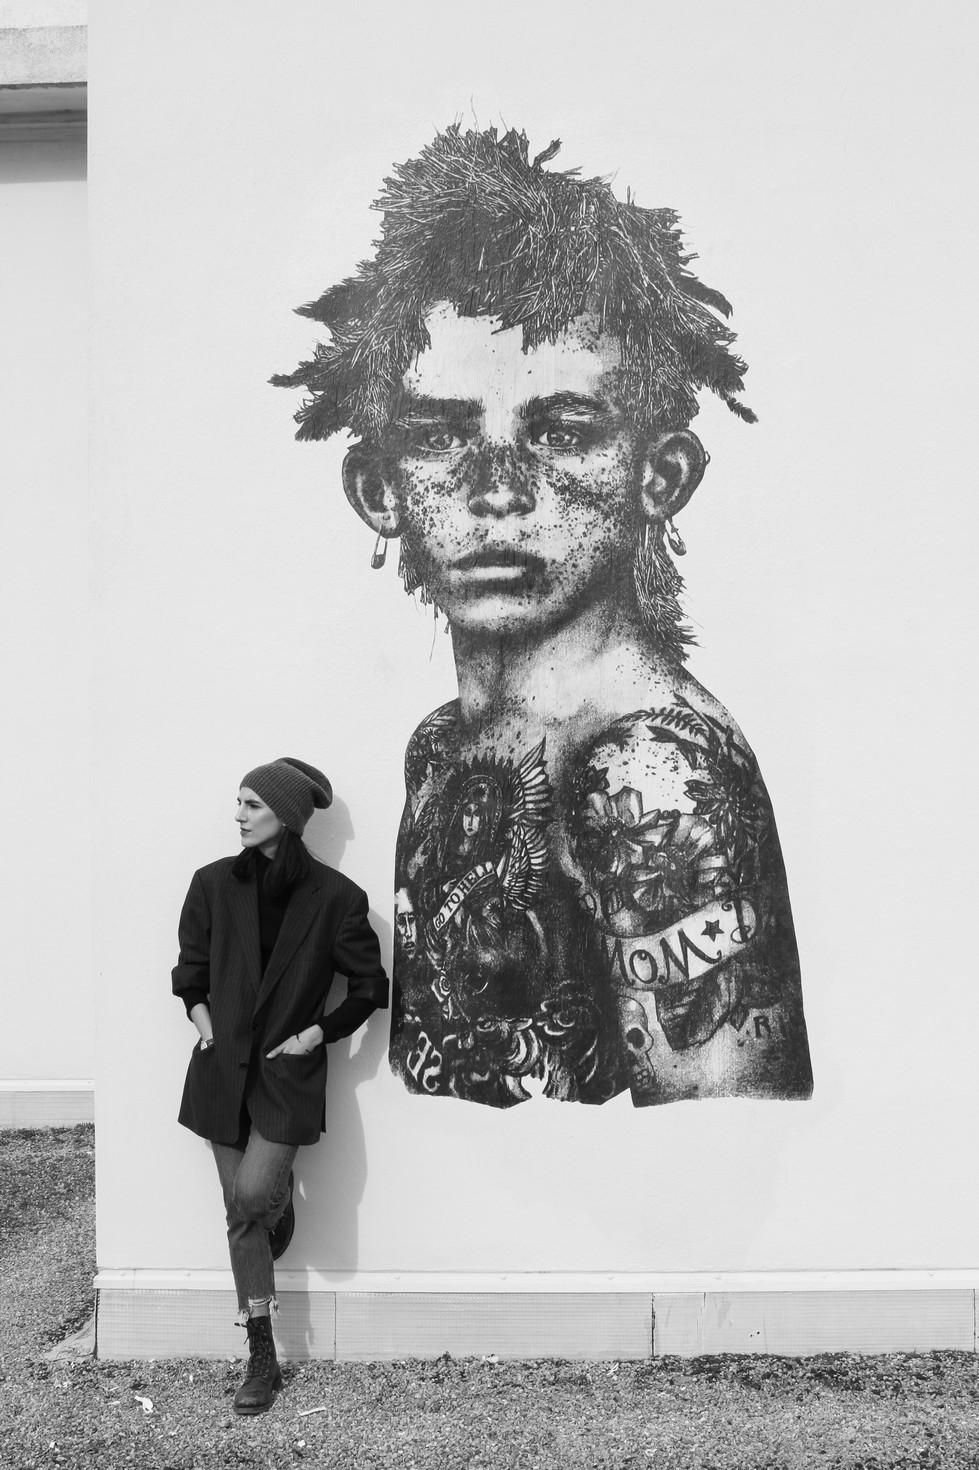 Marie-boraelvi-youth-collage-2019.jpg